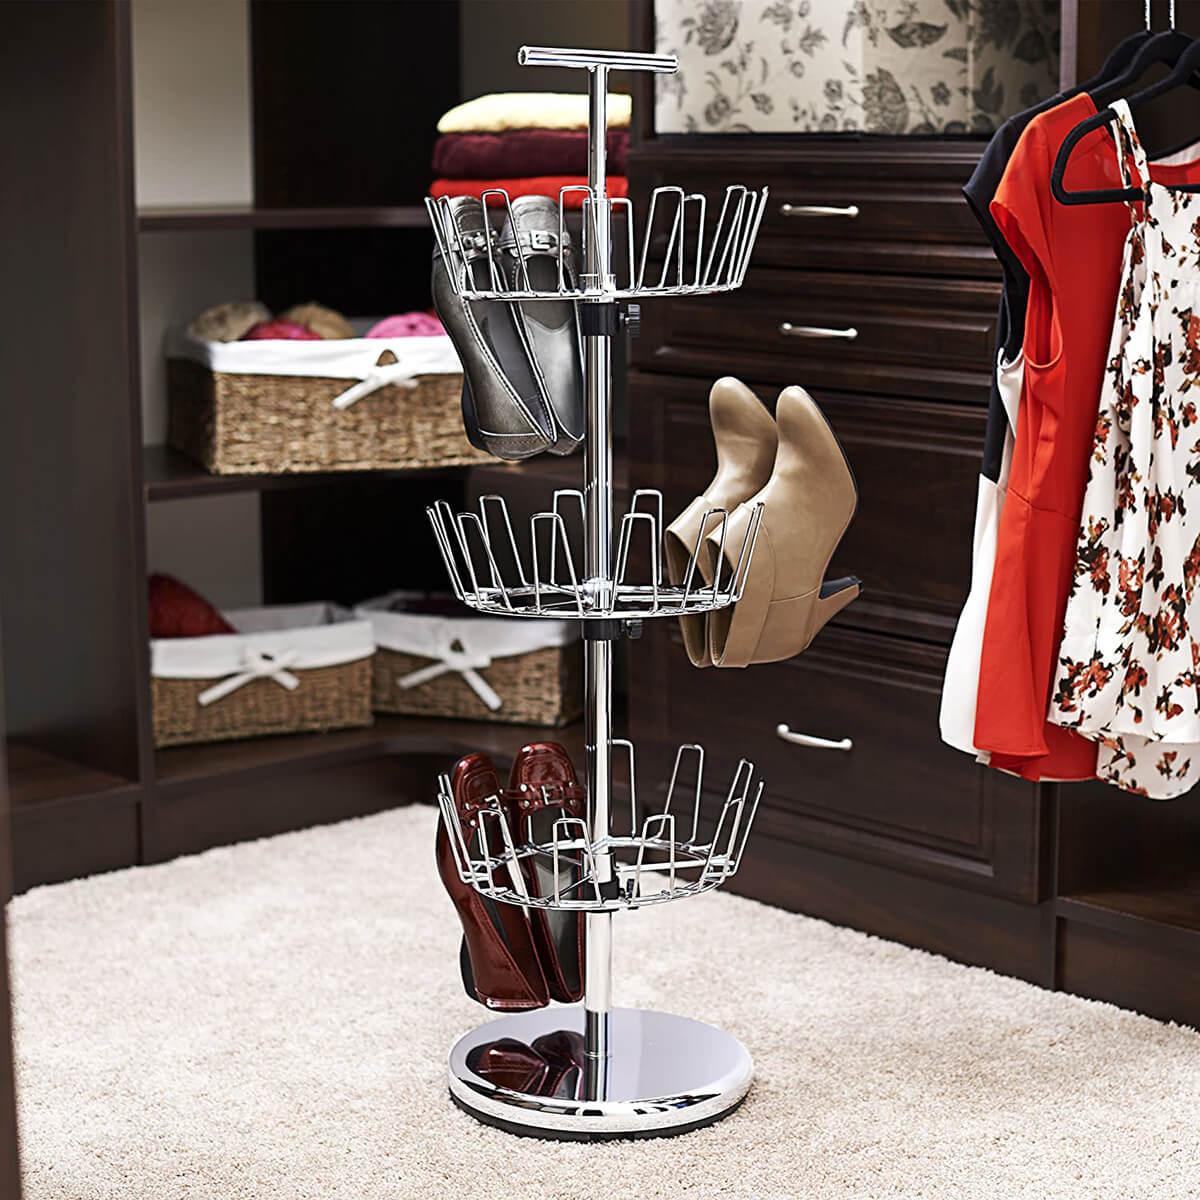 Revolving Rack for Vertical Shoe Storage